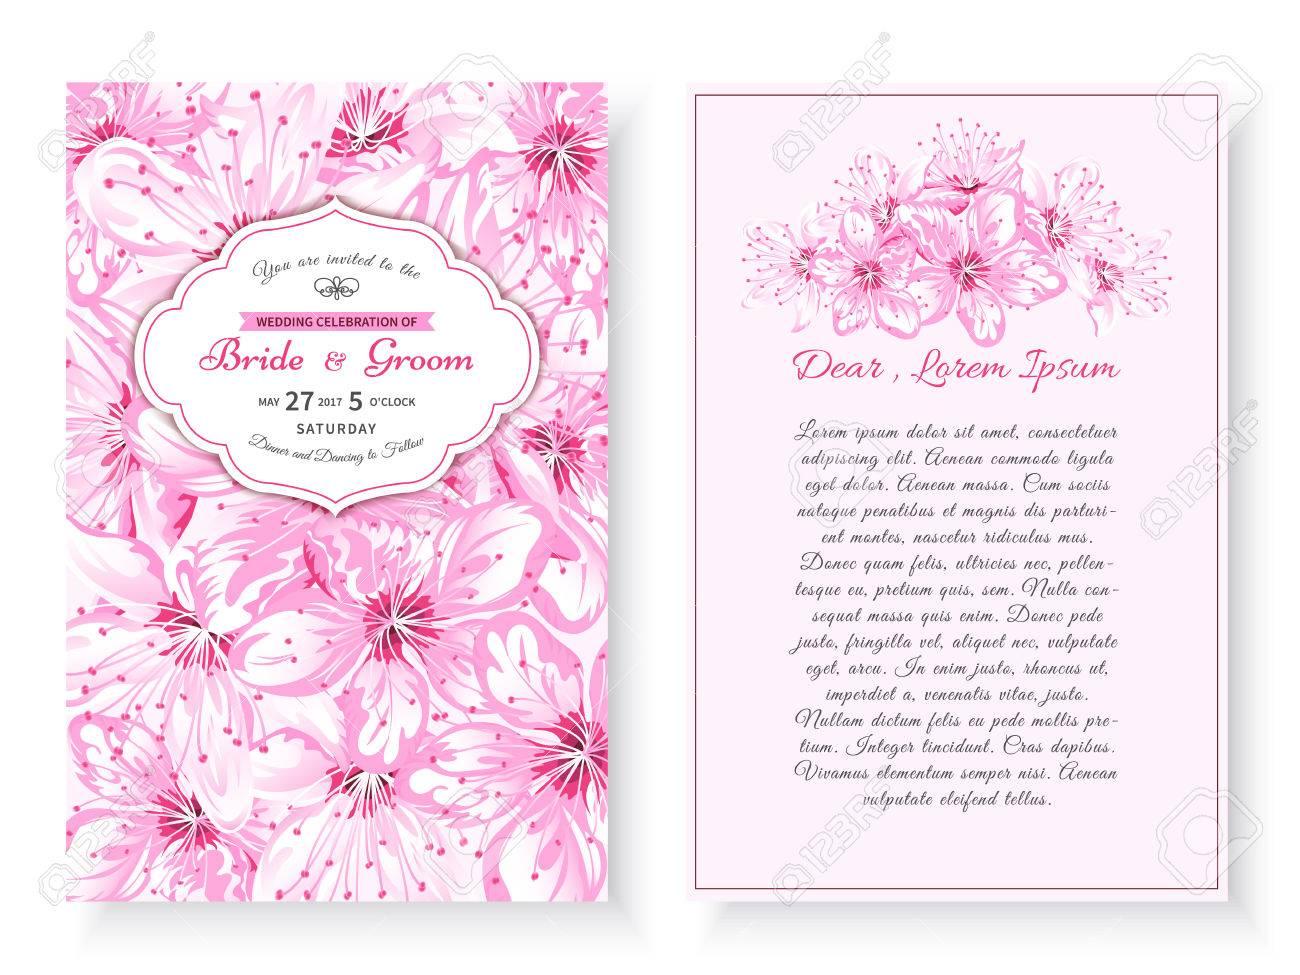 Vintage Floral Background.Wedding Card Or Invitation With Frame ...